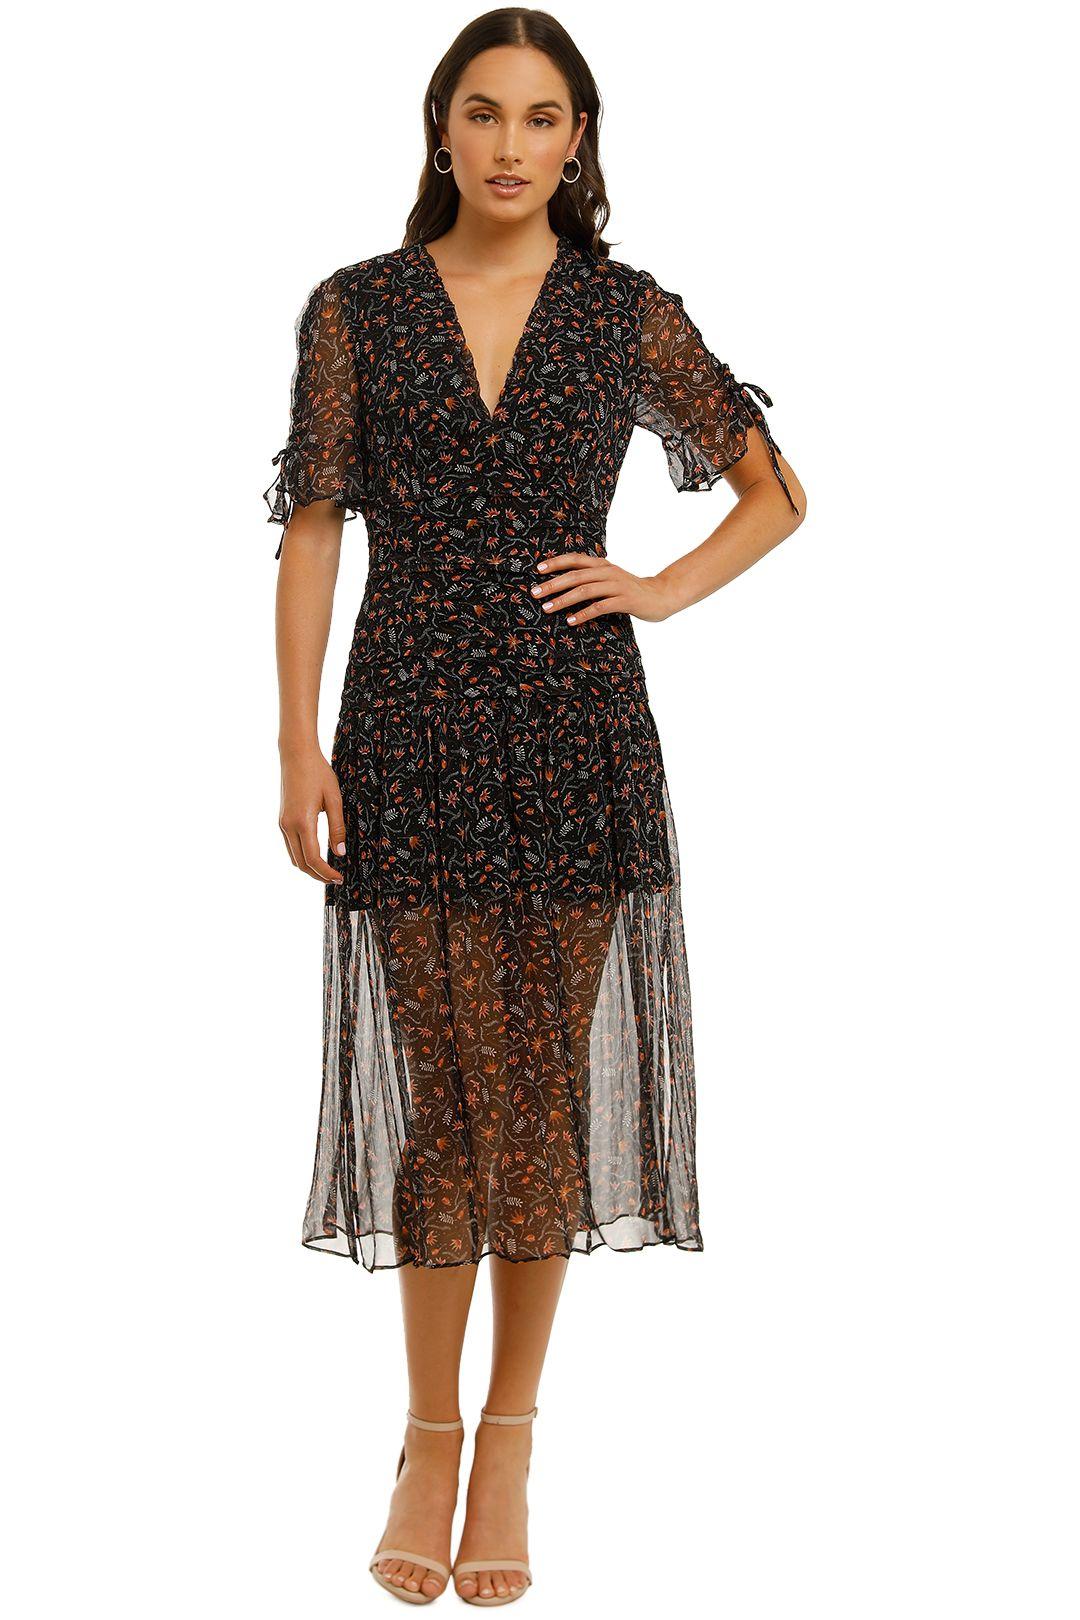 Stevie-May-Harriet-Midi-Dress-Silk-Road-Front